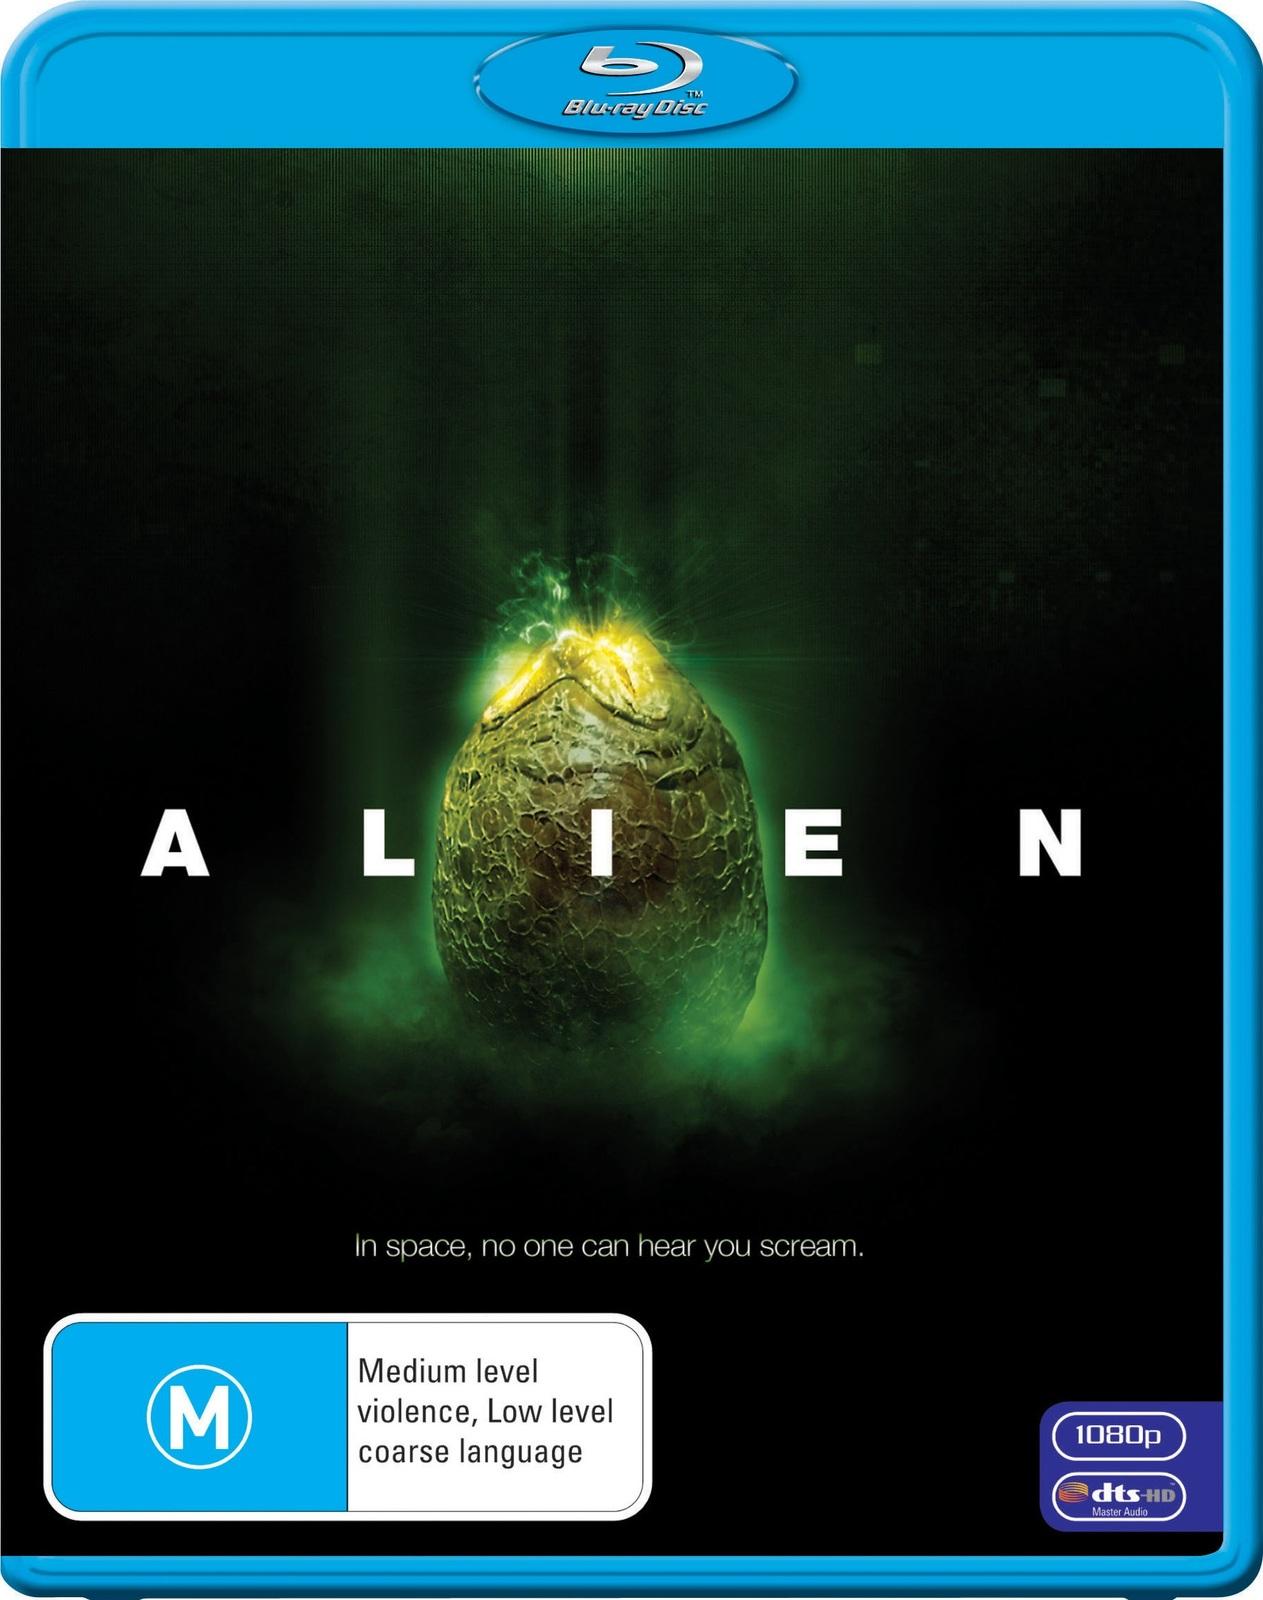 Alien on Blu-ray image